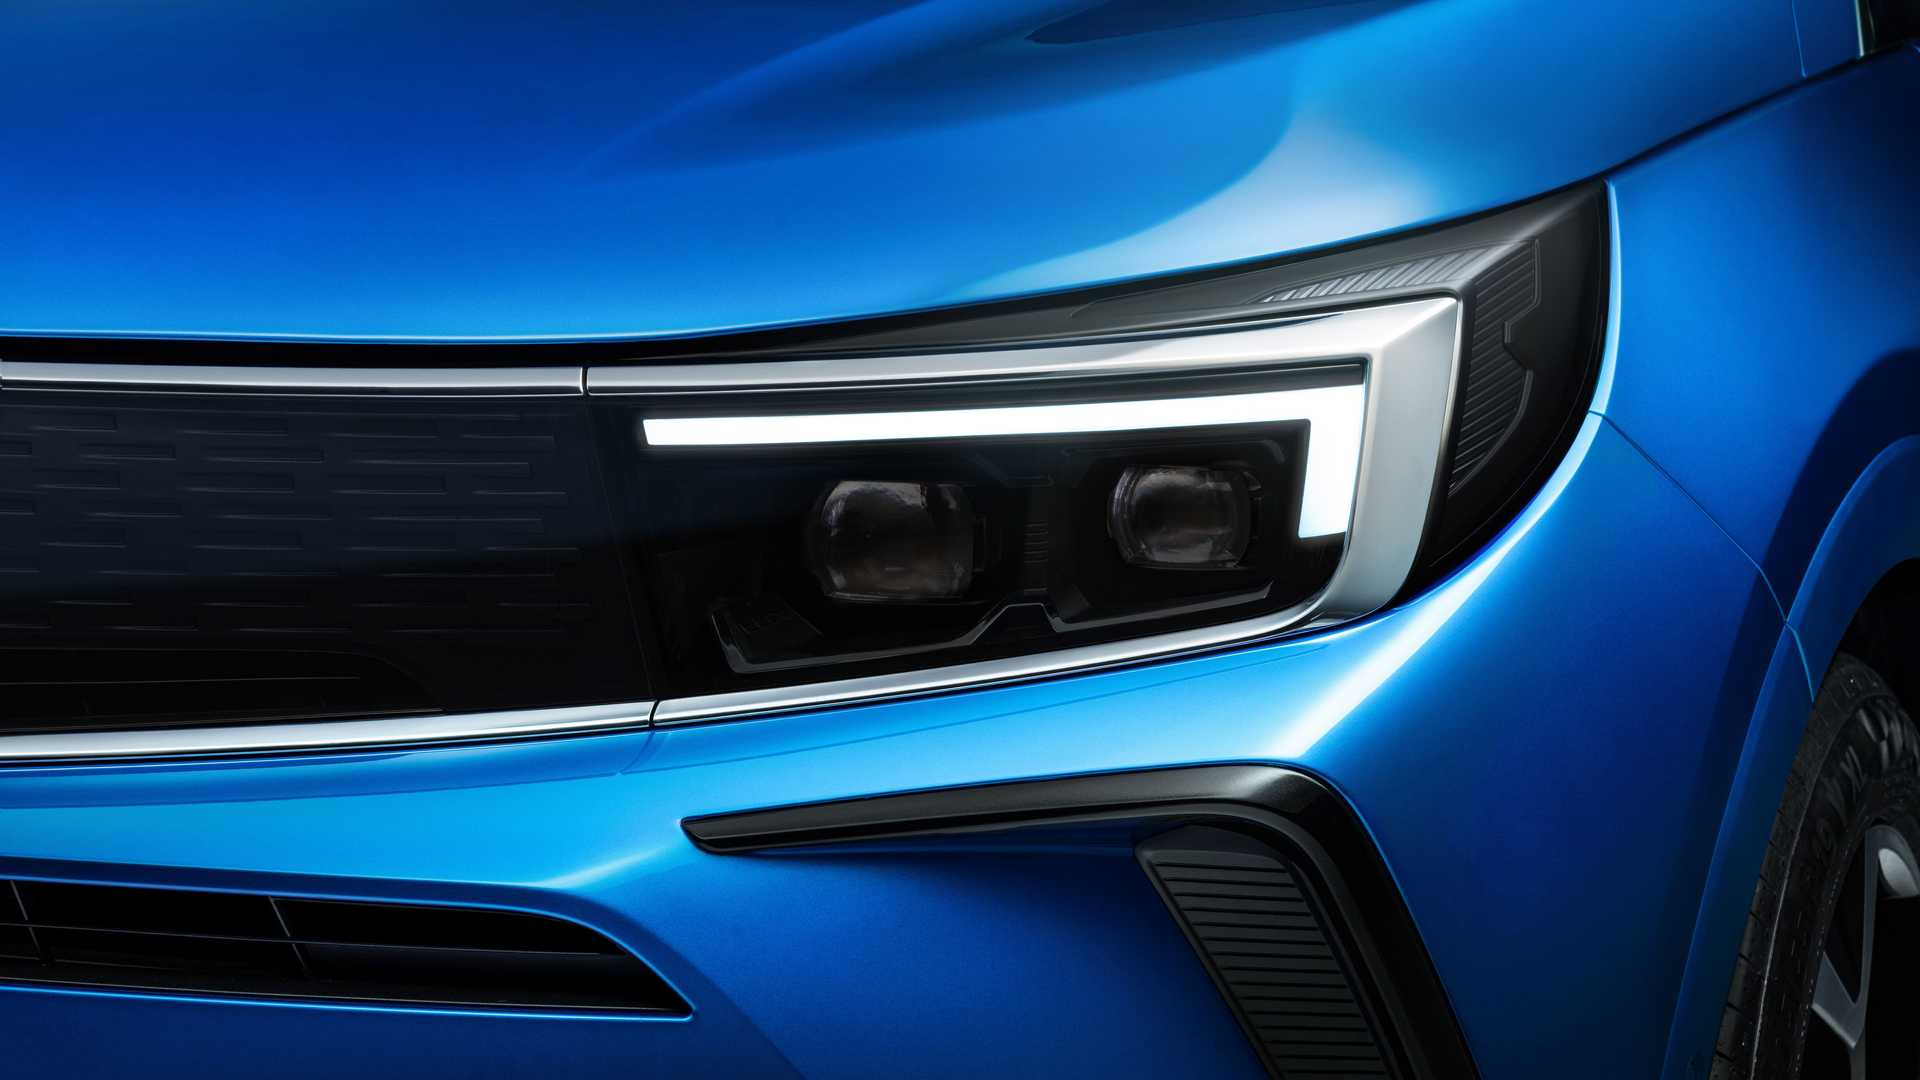 Fari Opel Grandland 2021 - IntelliLux